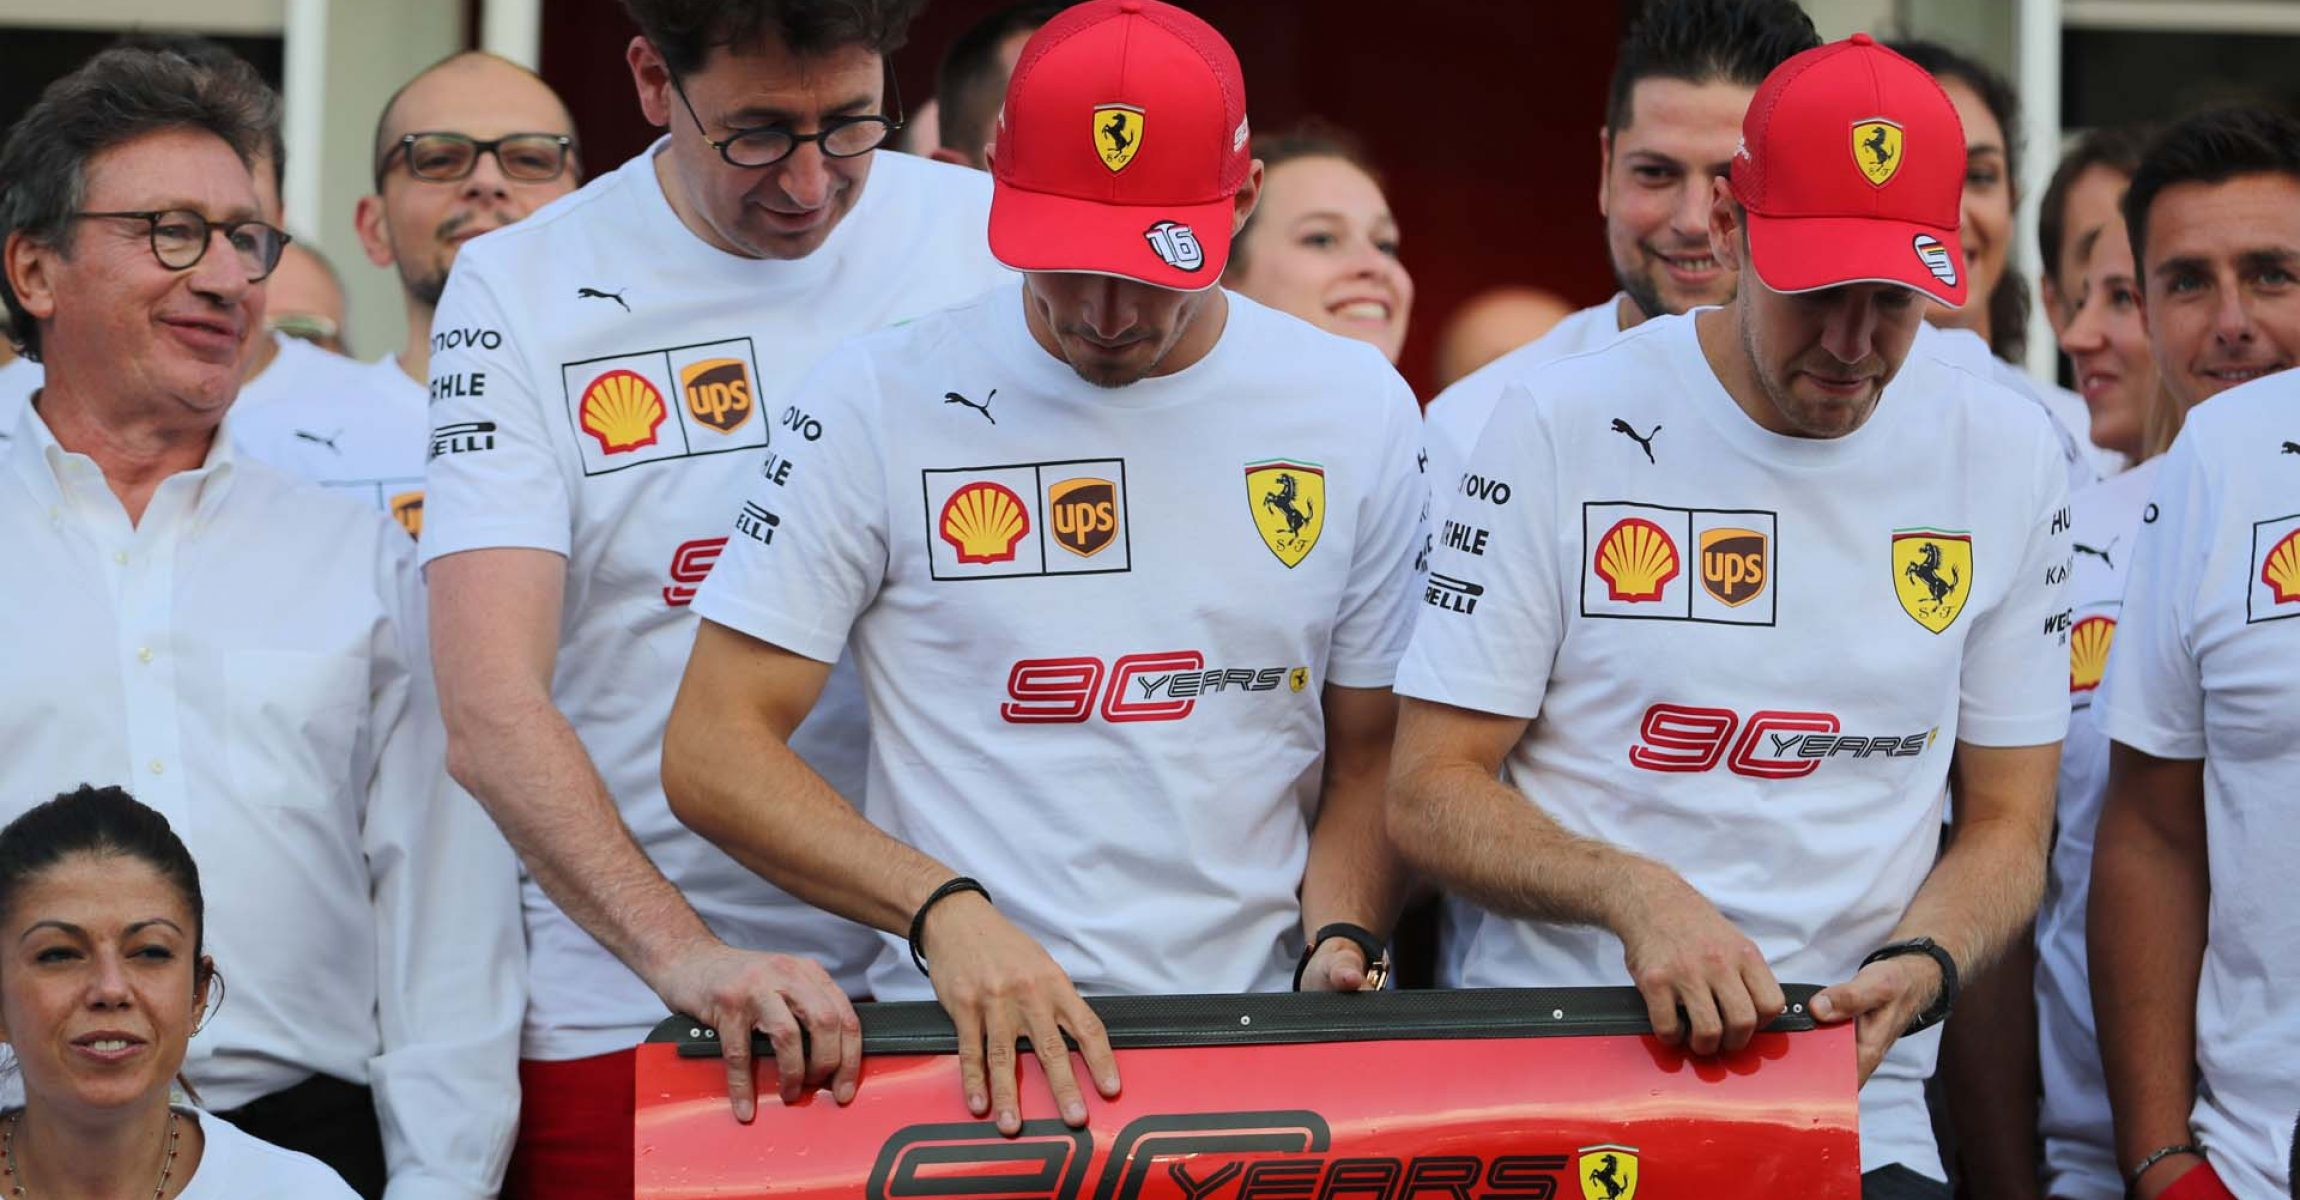 Mattia Binotto, Charles Leclerc, Sebastian Vettel, Ferrari team photo